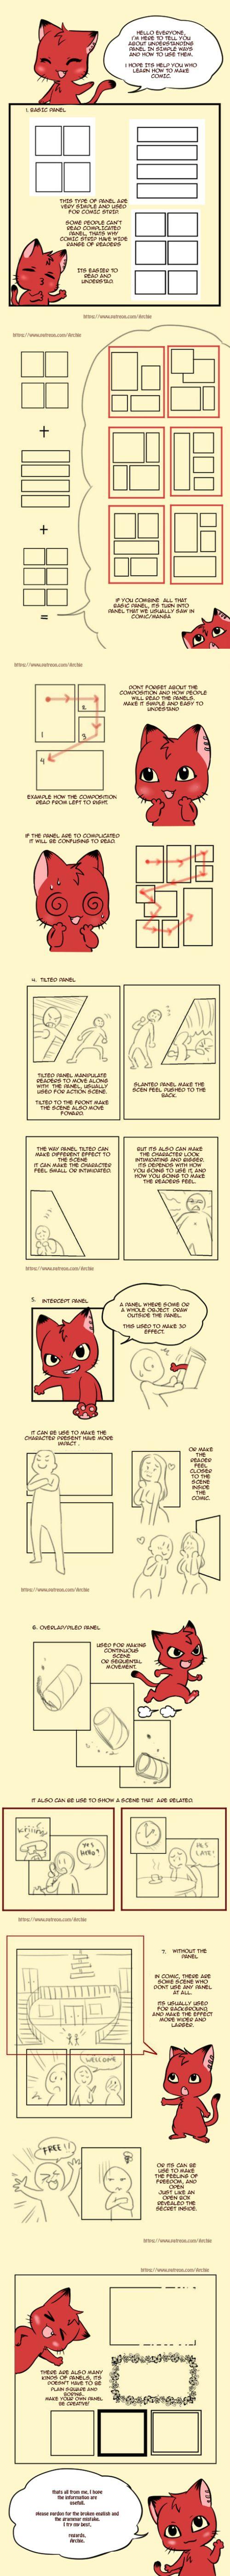 Simple Comic Panel Tutorial by chervenkotka. Patreon: https://www.patreon.com/Archie?ty=a via http://artist-advice.tumblr.com